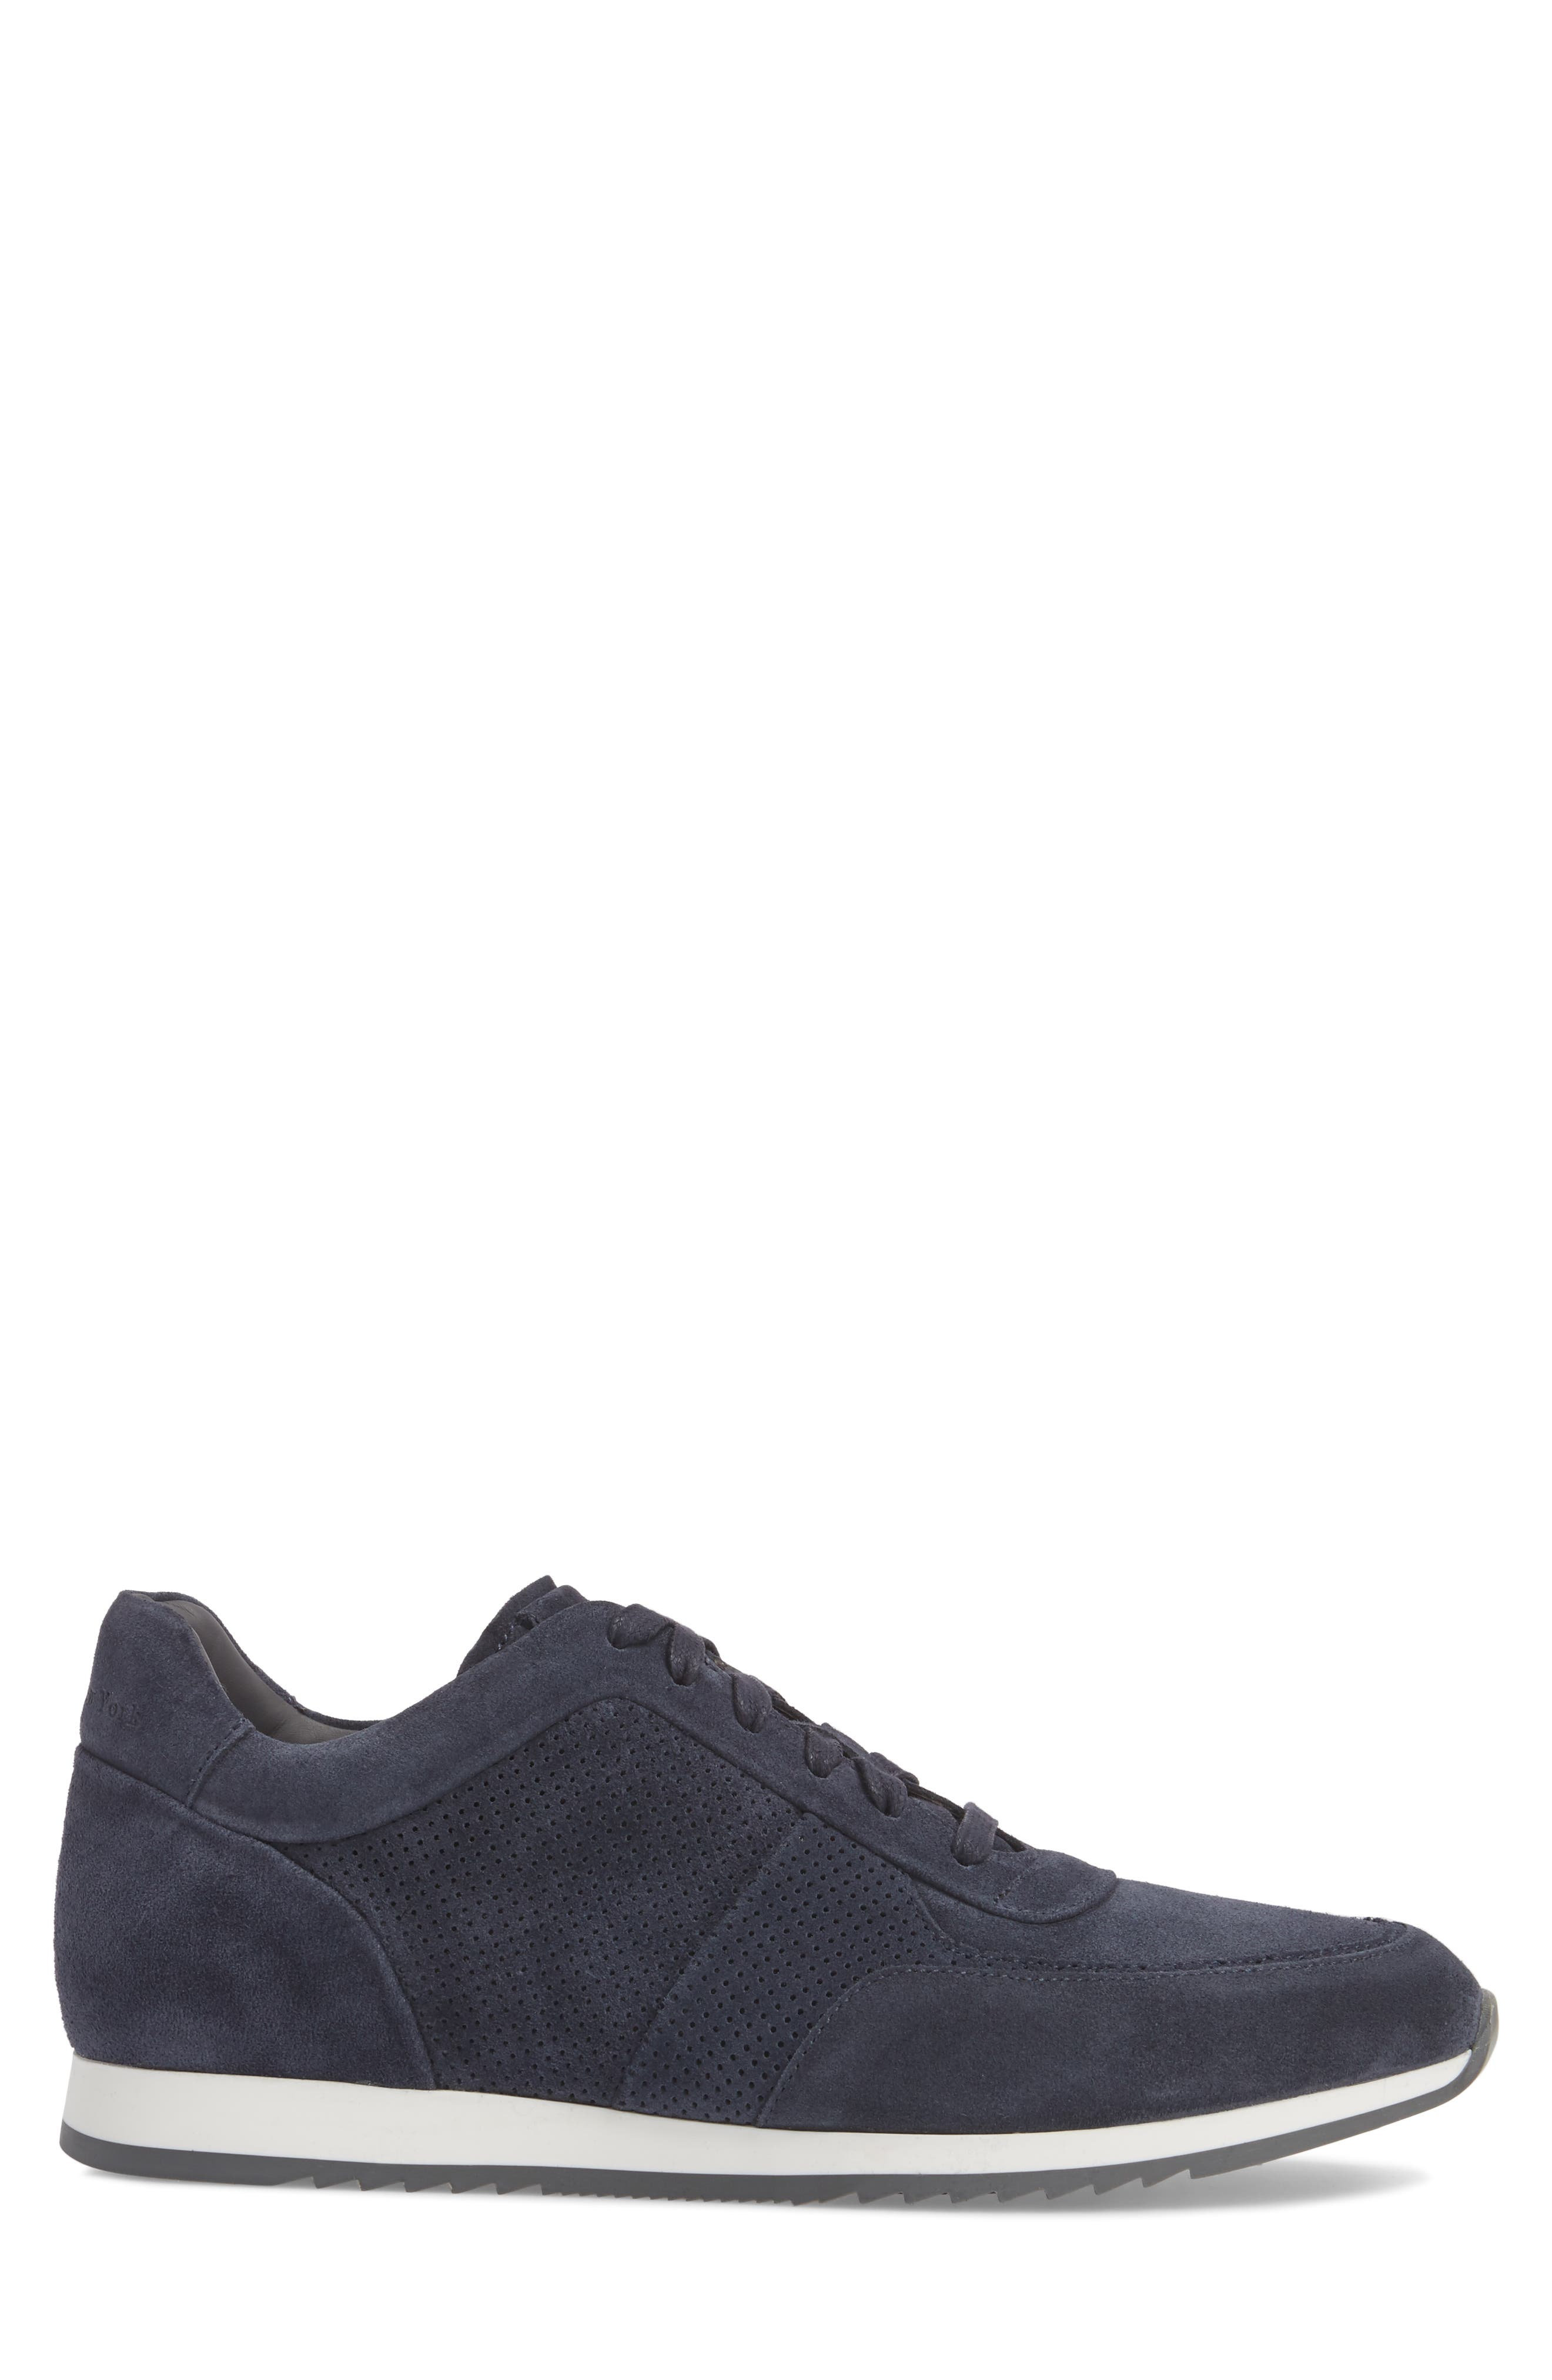 Alternate Image 3  - To Boot New York Fordham Low Top Sneaker (Men)